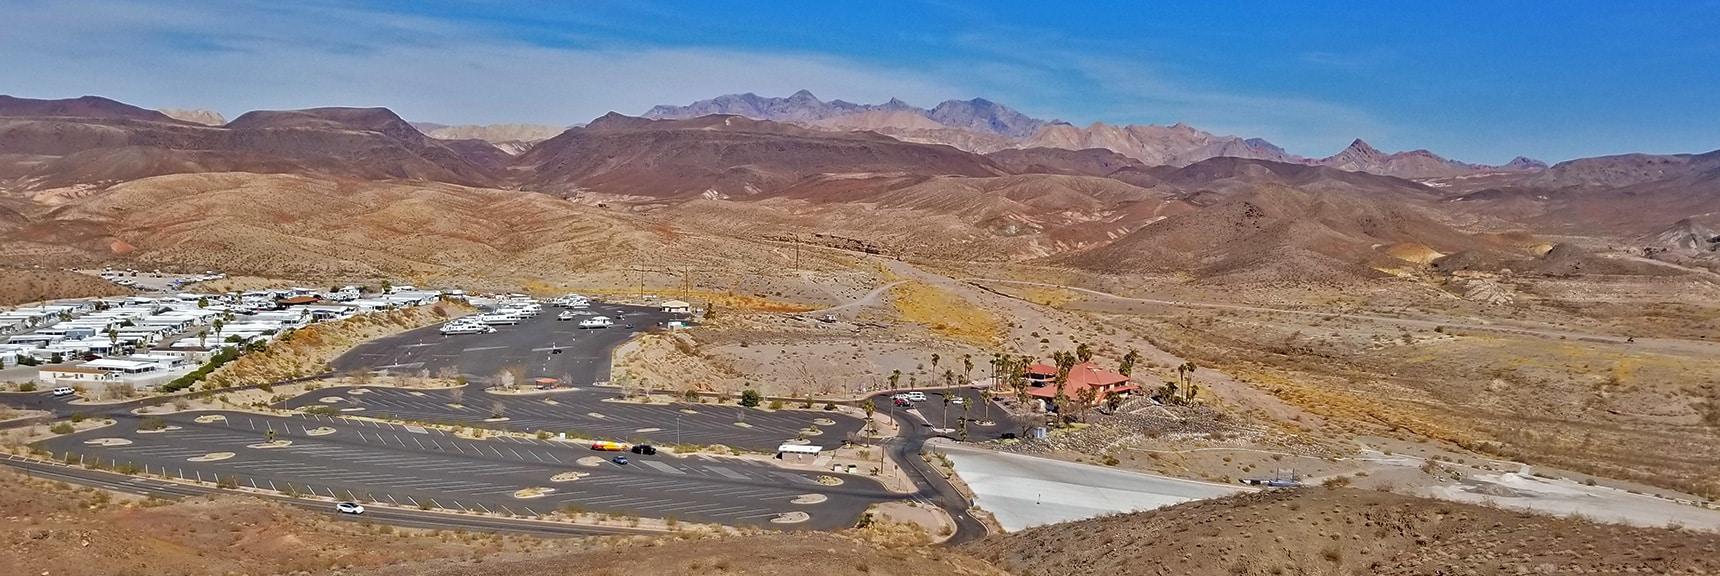 View Across Callville Bay Toward Muddy Mountains   Callville Summit Trail   Lake Mead National Recreation Area, Nevada